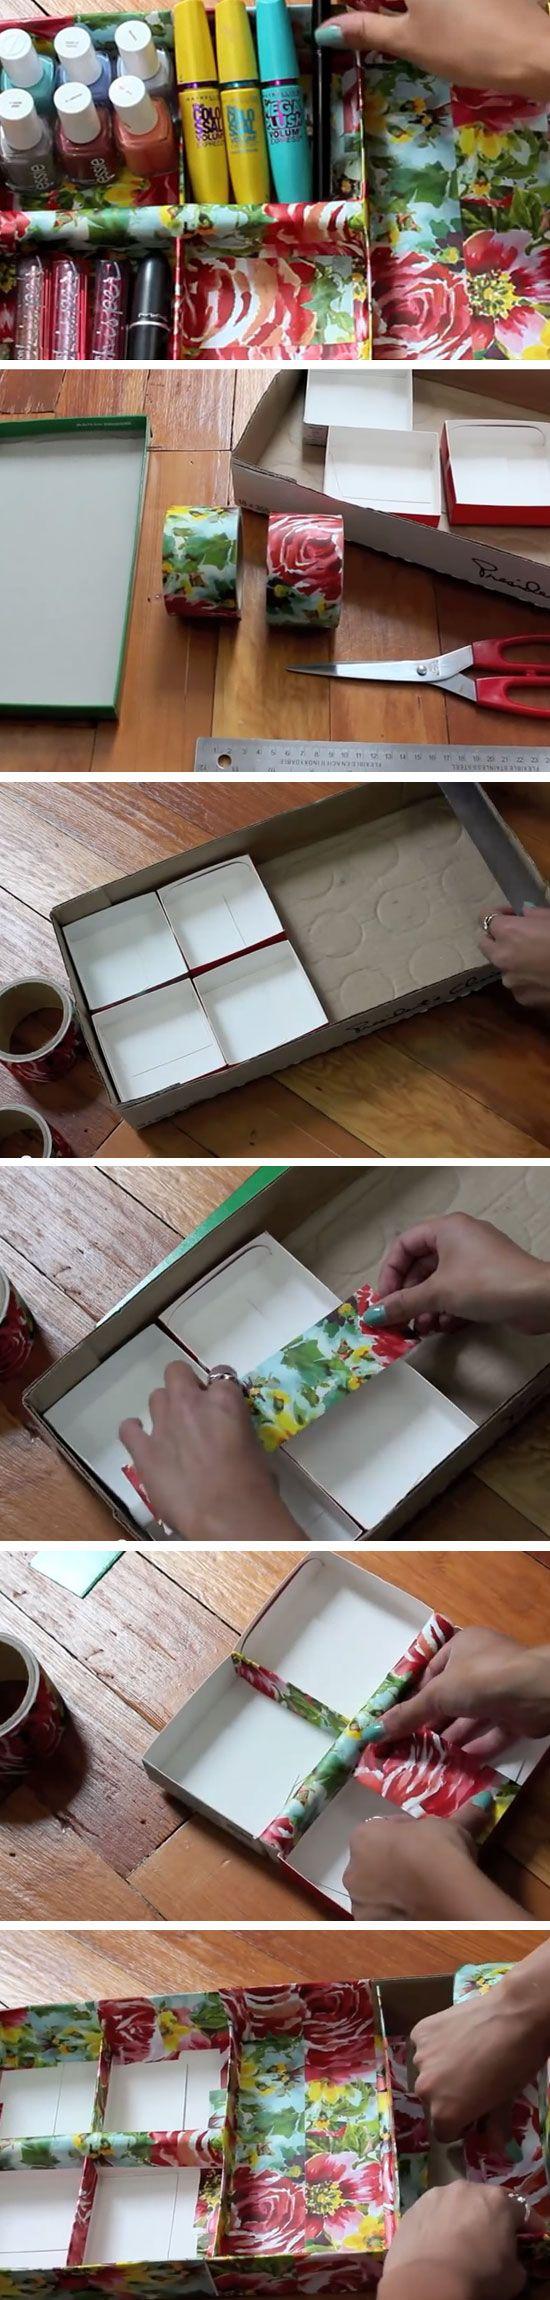 Cardboard + Tape | Sneaky Storage Ideas for Teen Girls Room